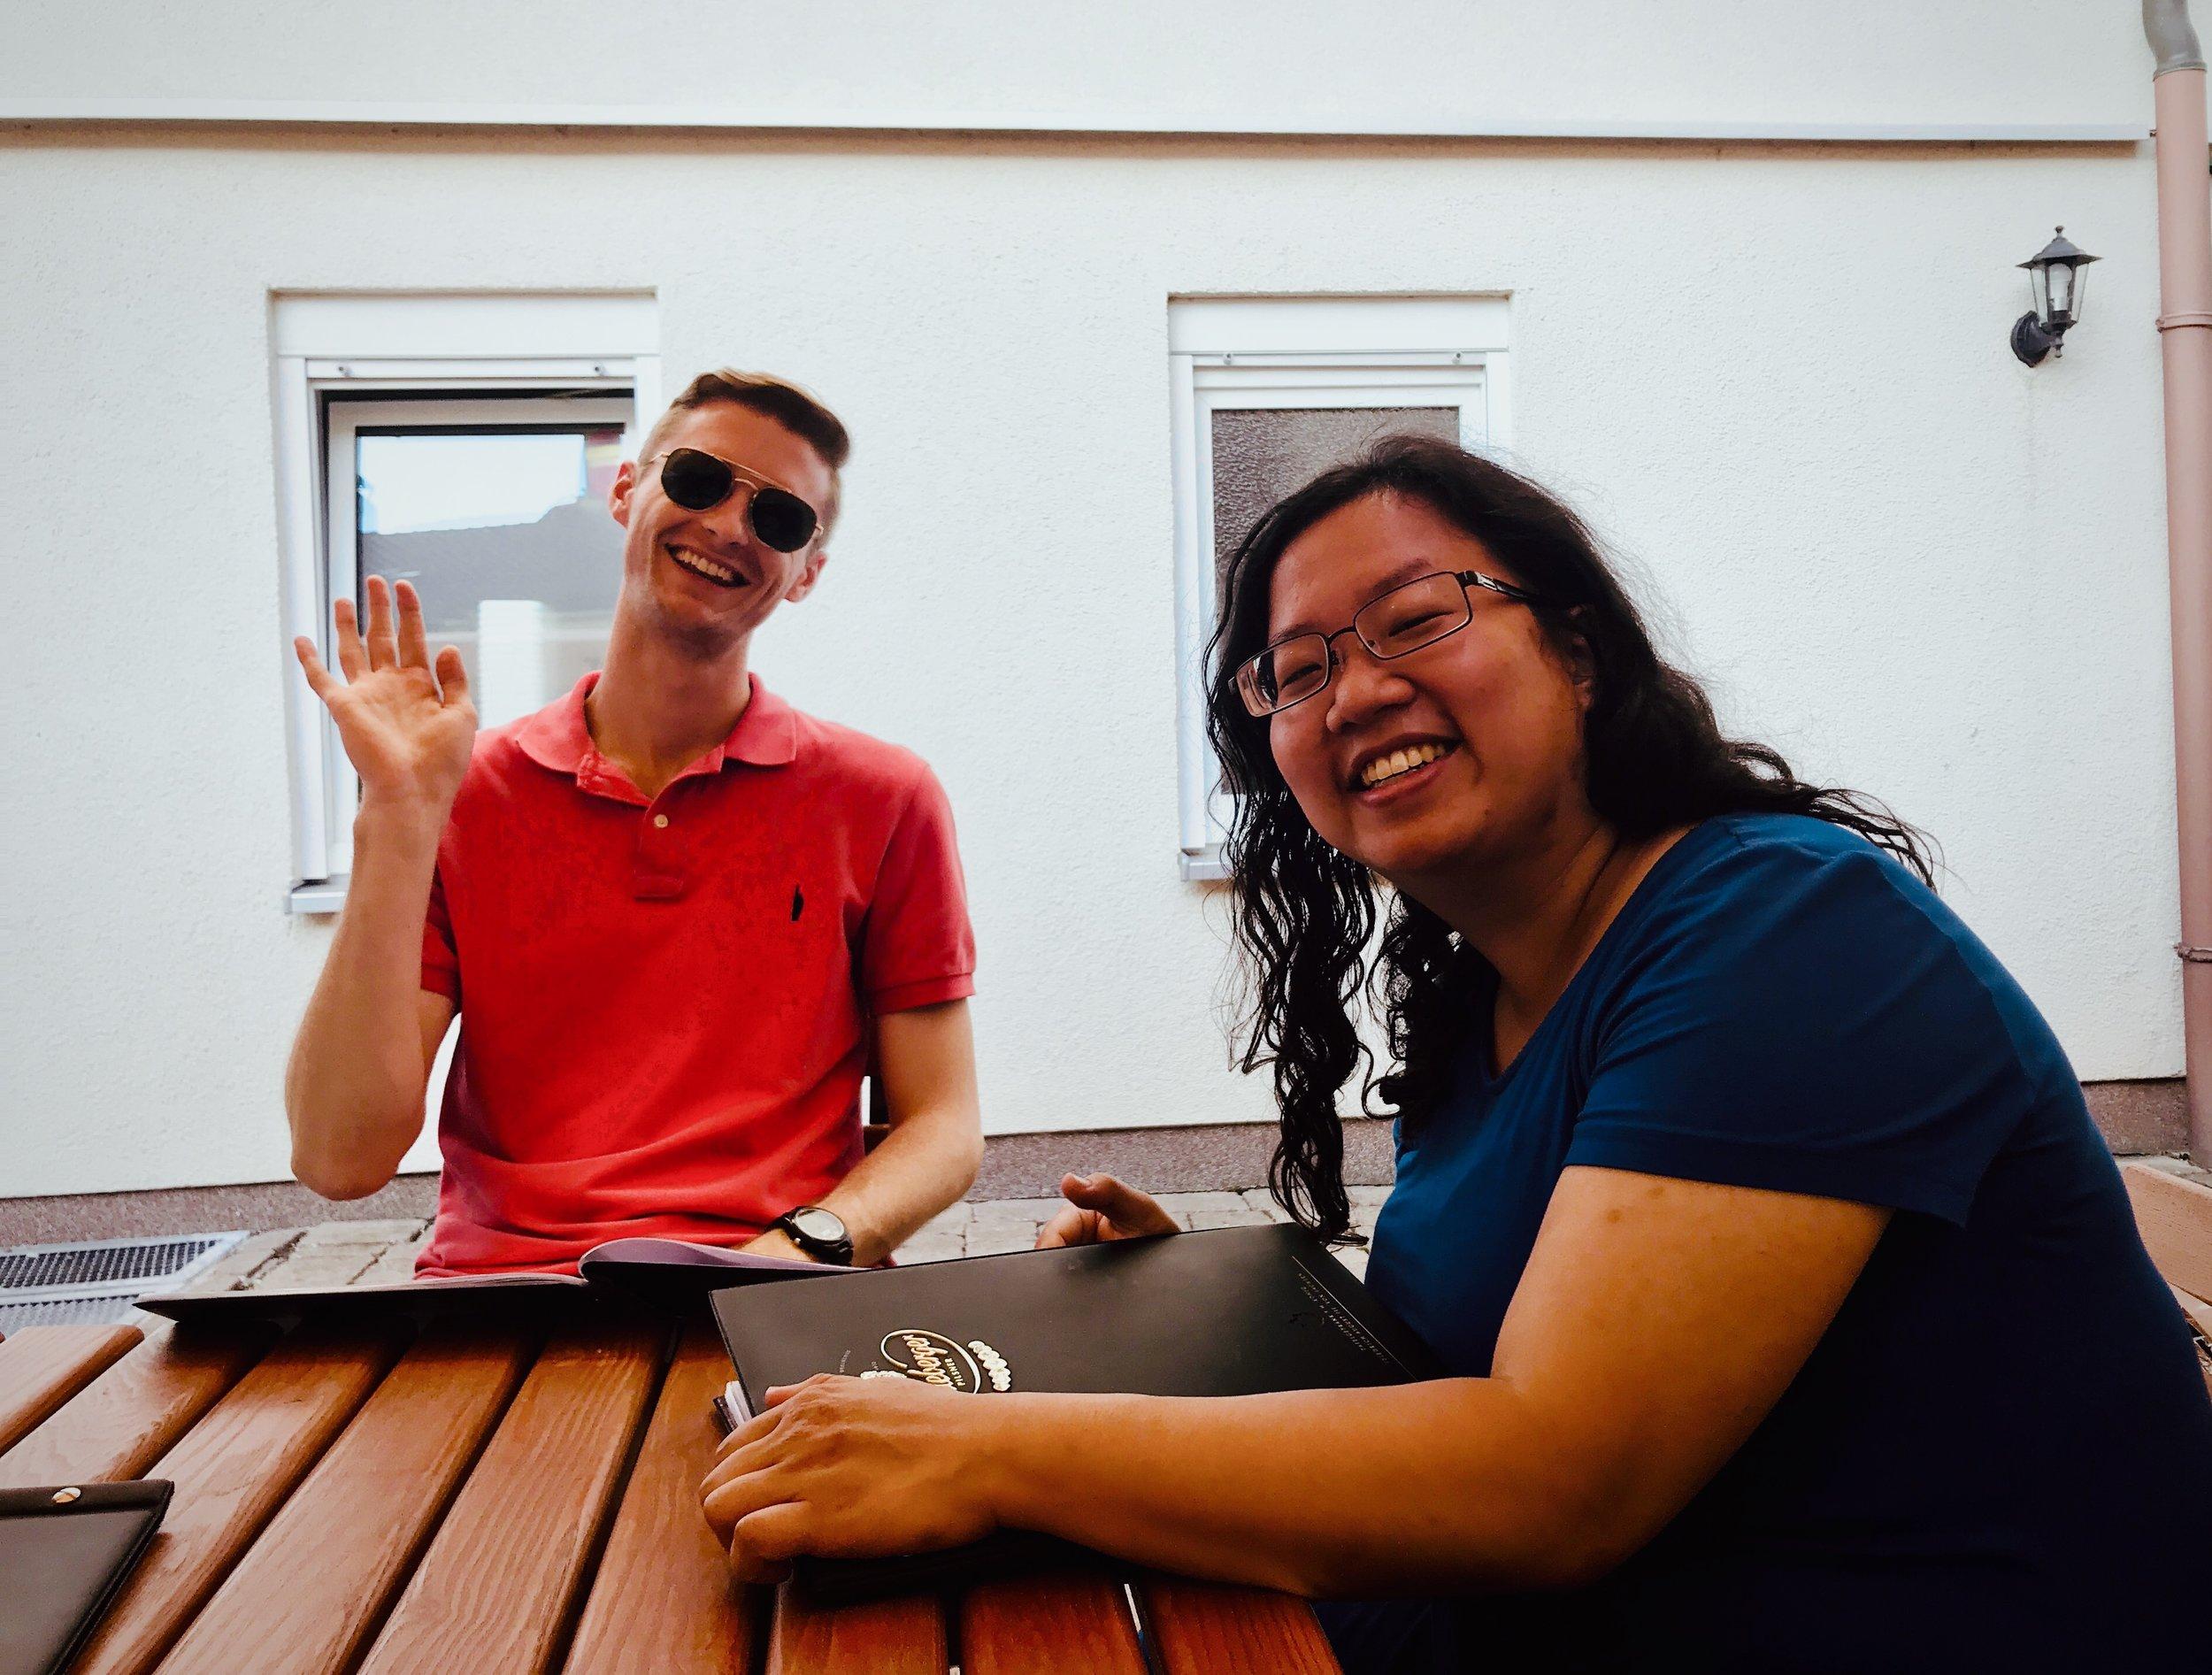 Evan Currie and Jennifer Hsiao enjoy dinner in Eisenach.